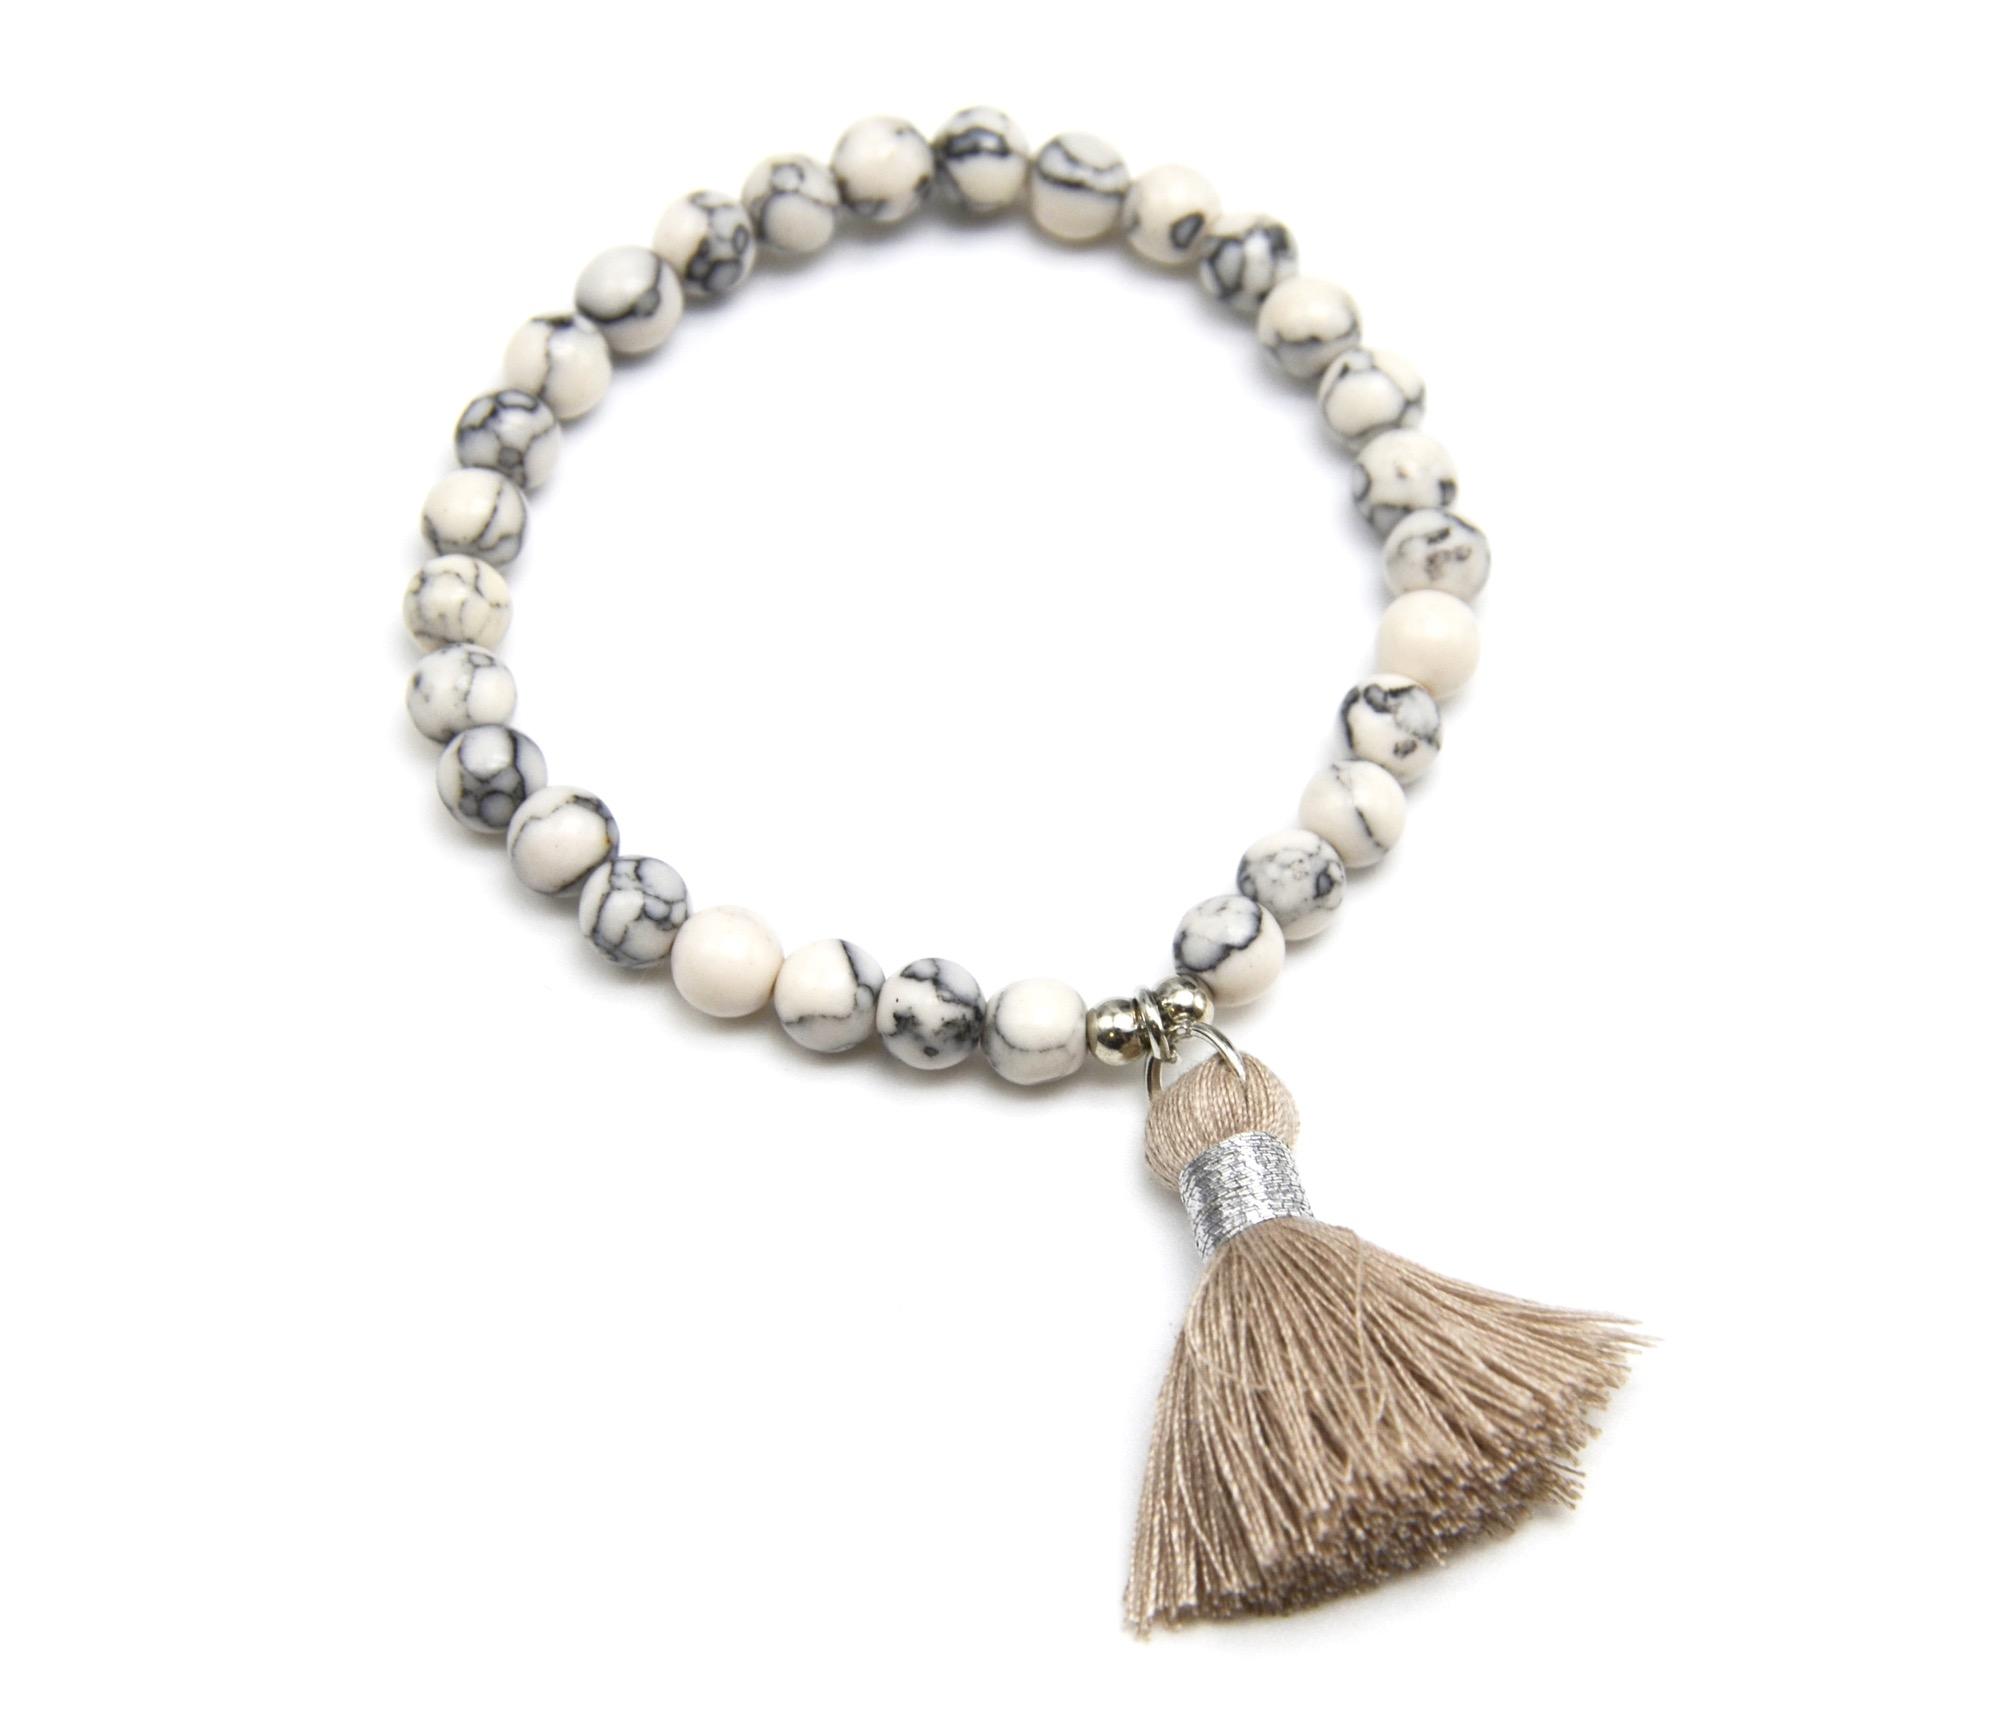 bc1706f bracelet elastique perles effet marbre avec charm pompon taupe oh my shop. Black Bedroom Furniture Sets. Home Design Ideas